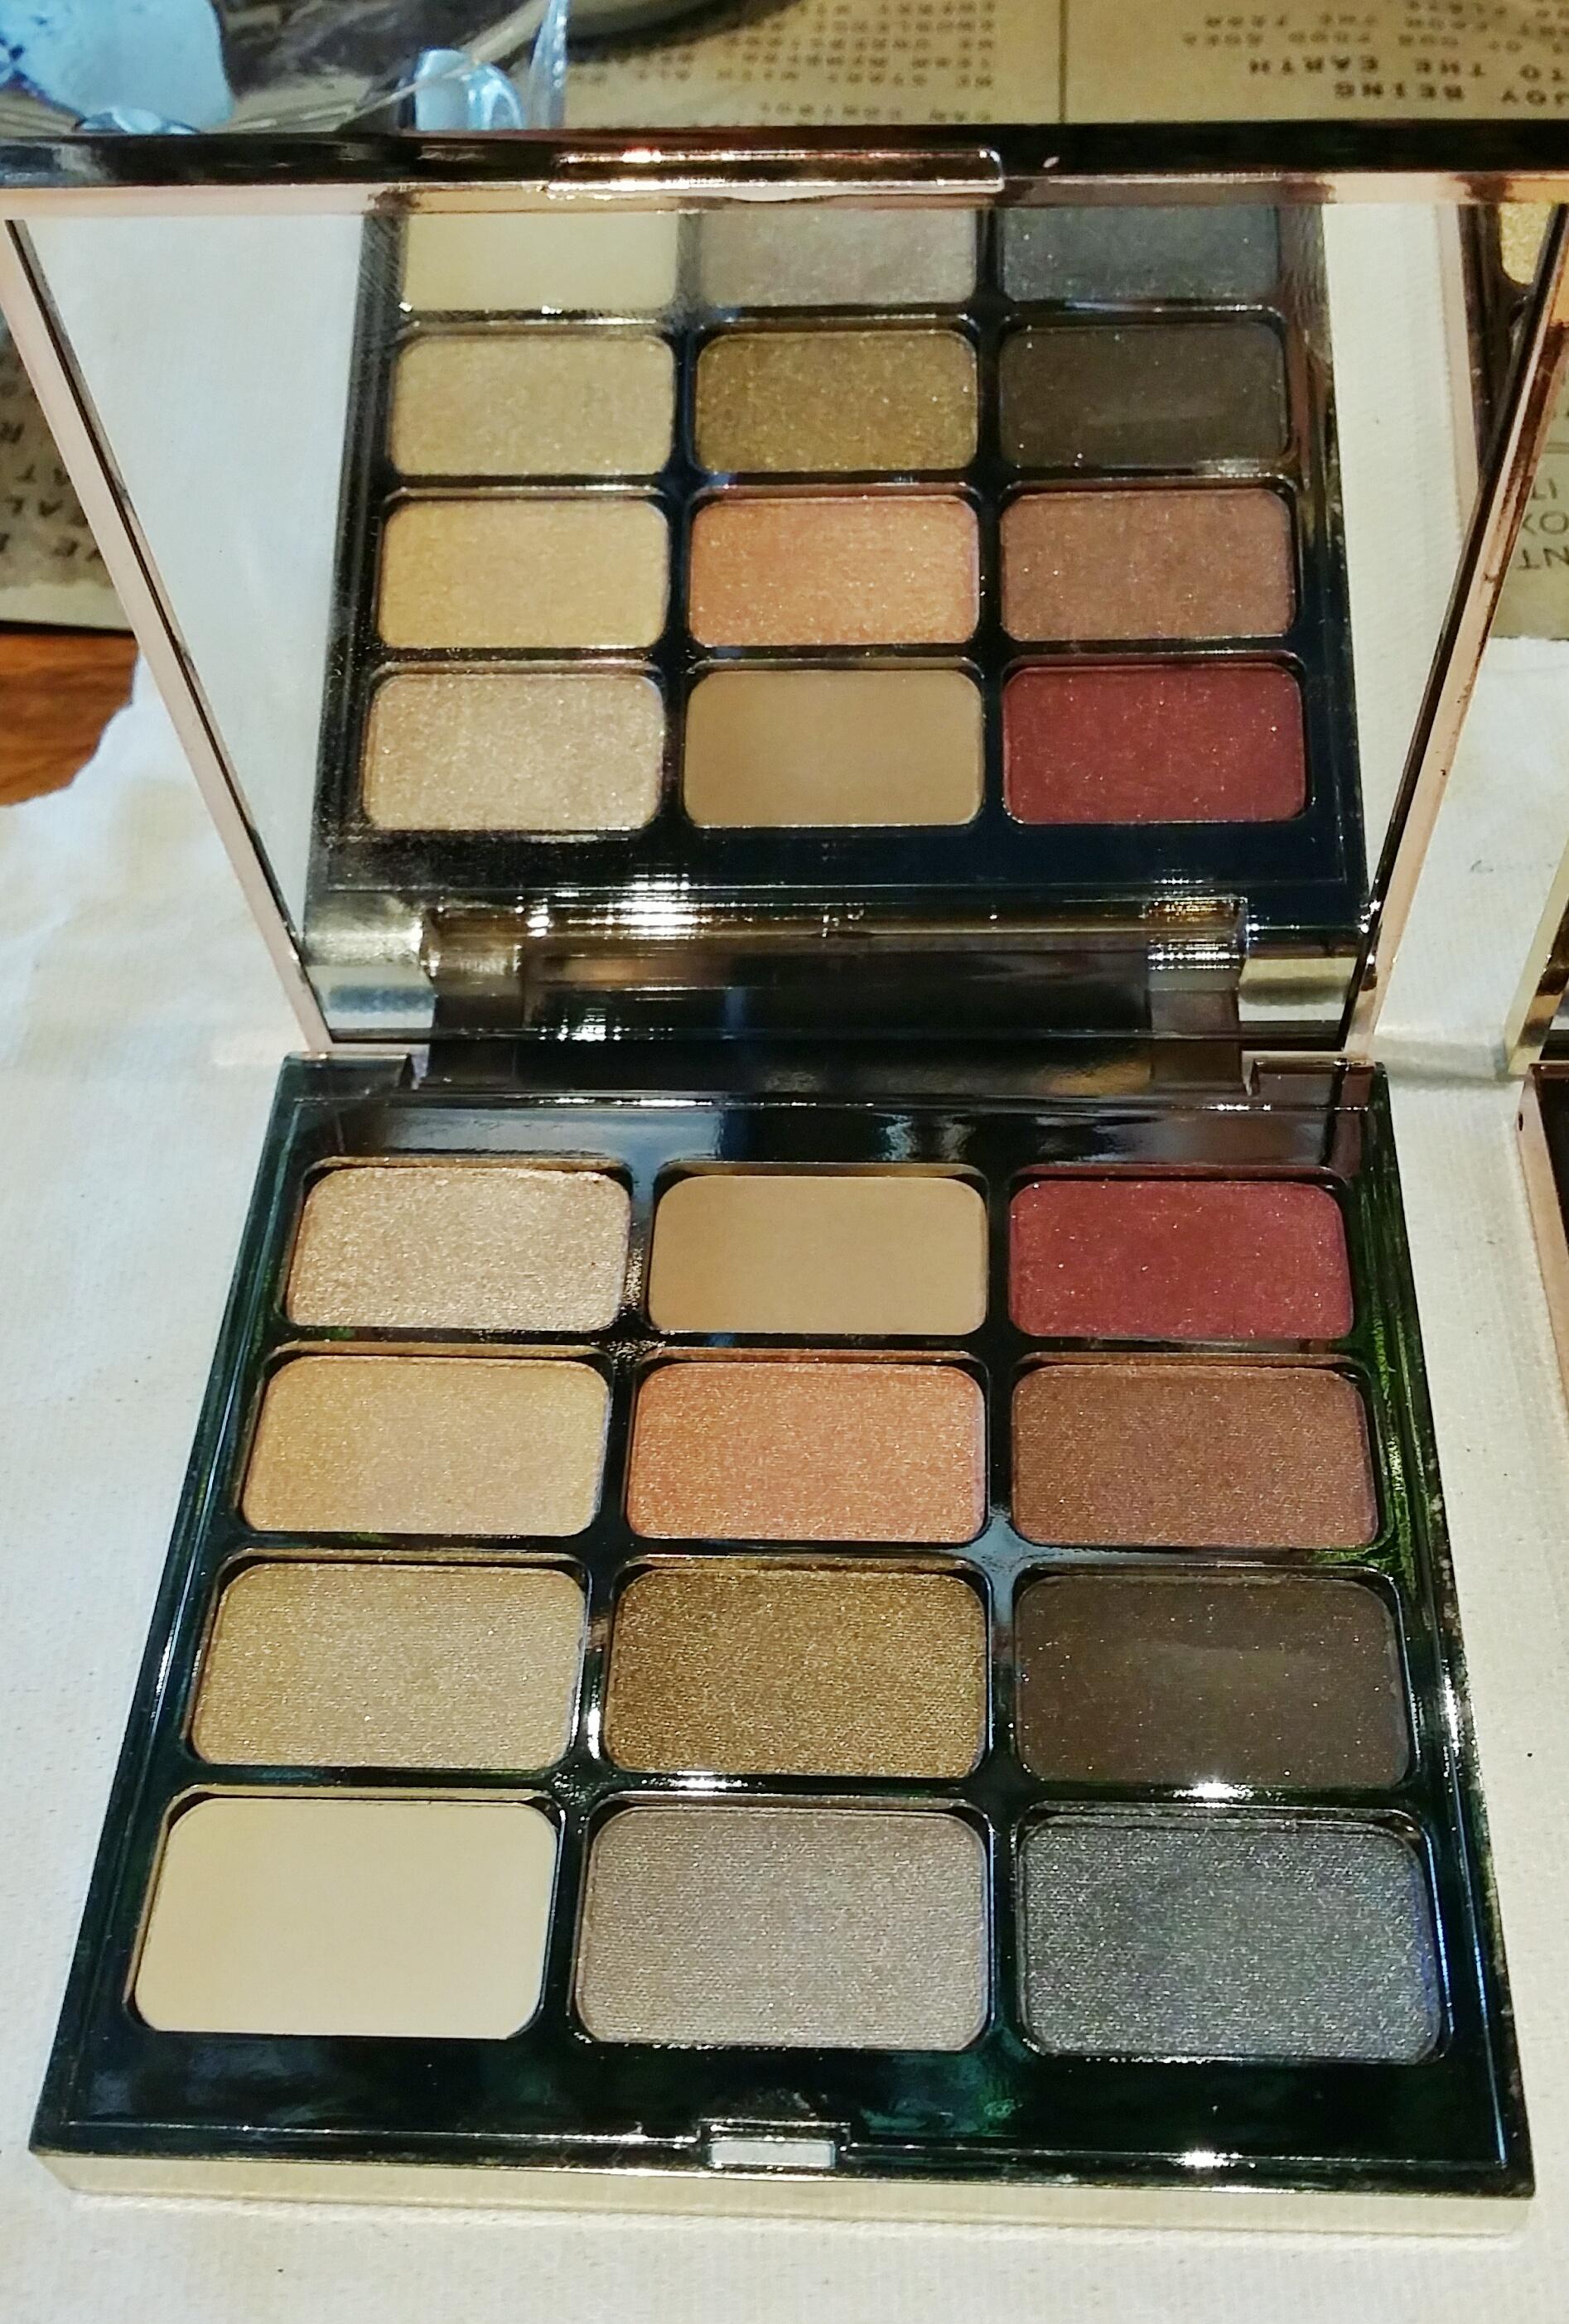 Stila-new-eye-shadow-palette